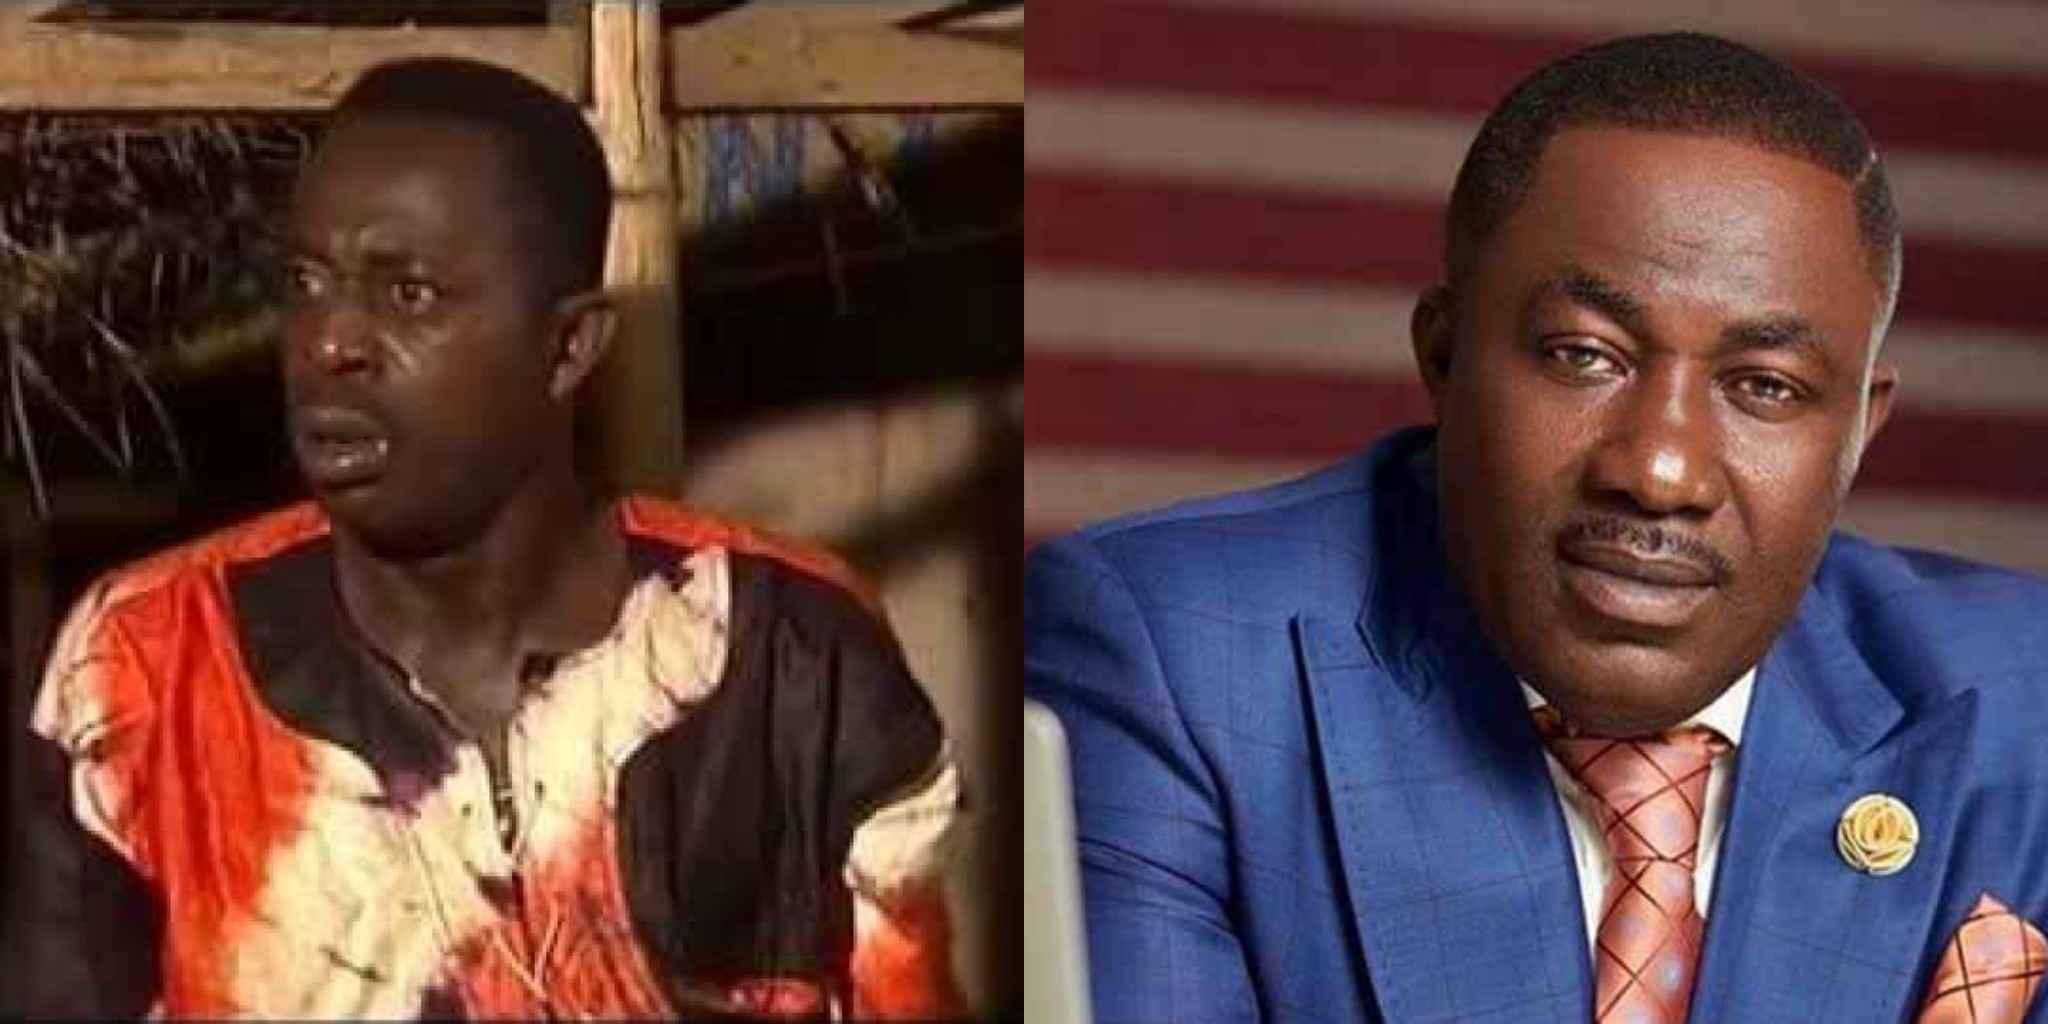 Kwame Despite is very WICKED – Judas reveals